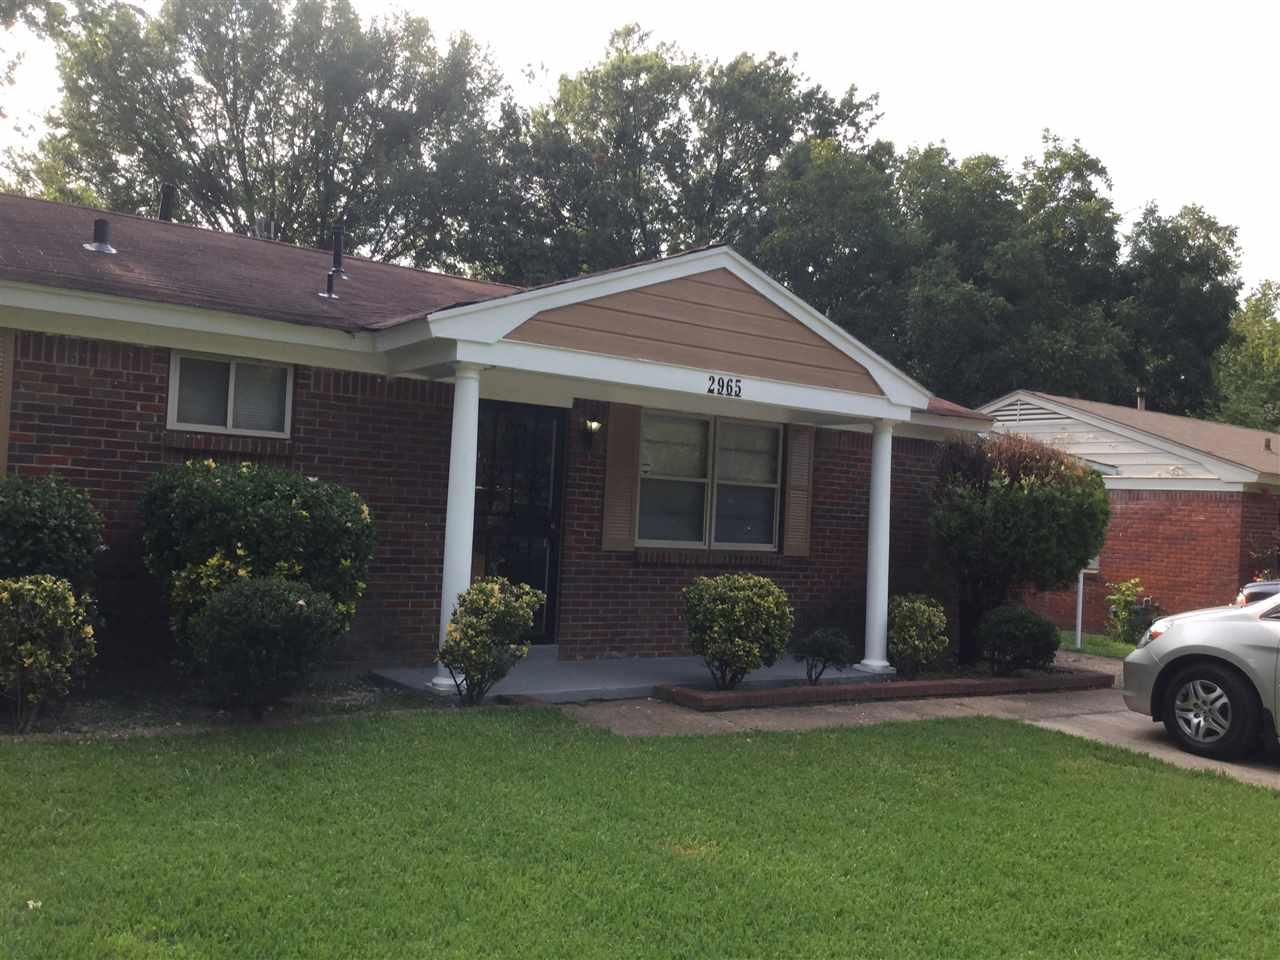 2965 Dearing Memphis, TN 38118 - MLS #: 10009062